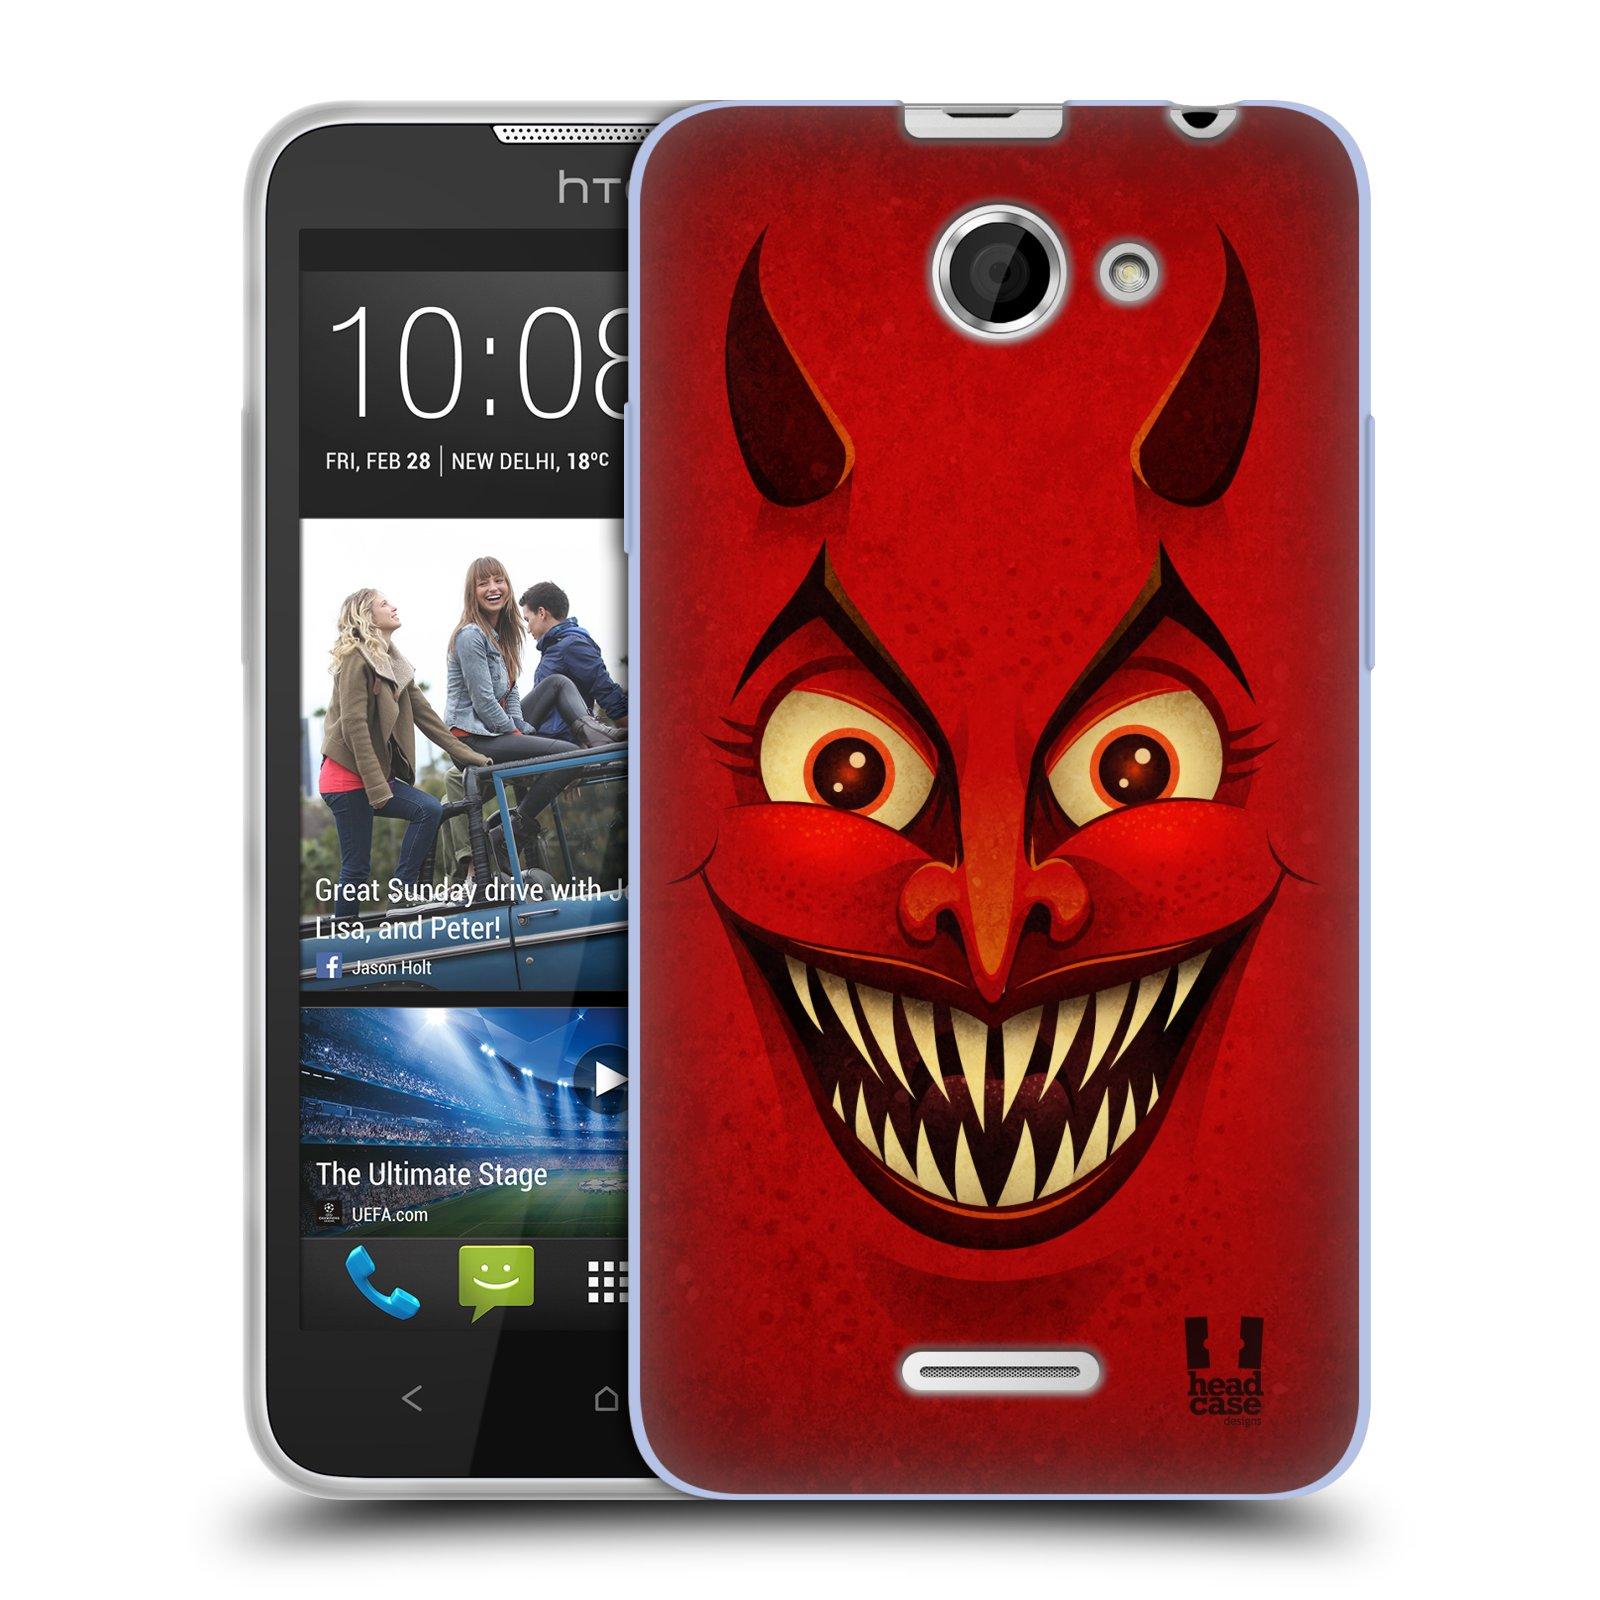 Silikonové pouzdro na mobil HTC Desire 516 HEAD CASE ČERT (Silikonový kryt či obal na mobilní telefon HTC Desire 516 Dual SIM)